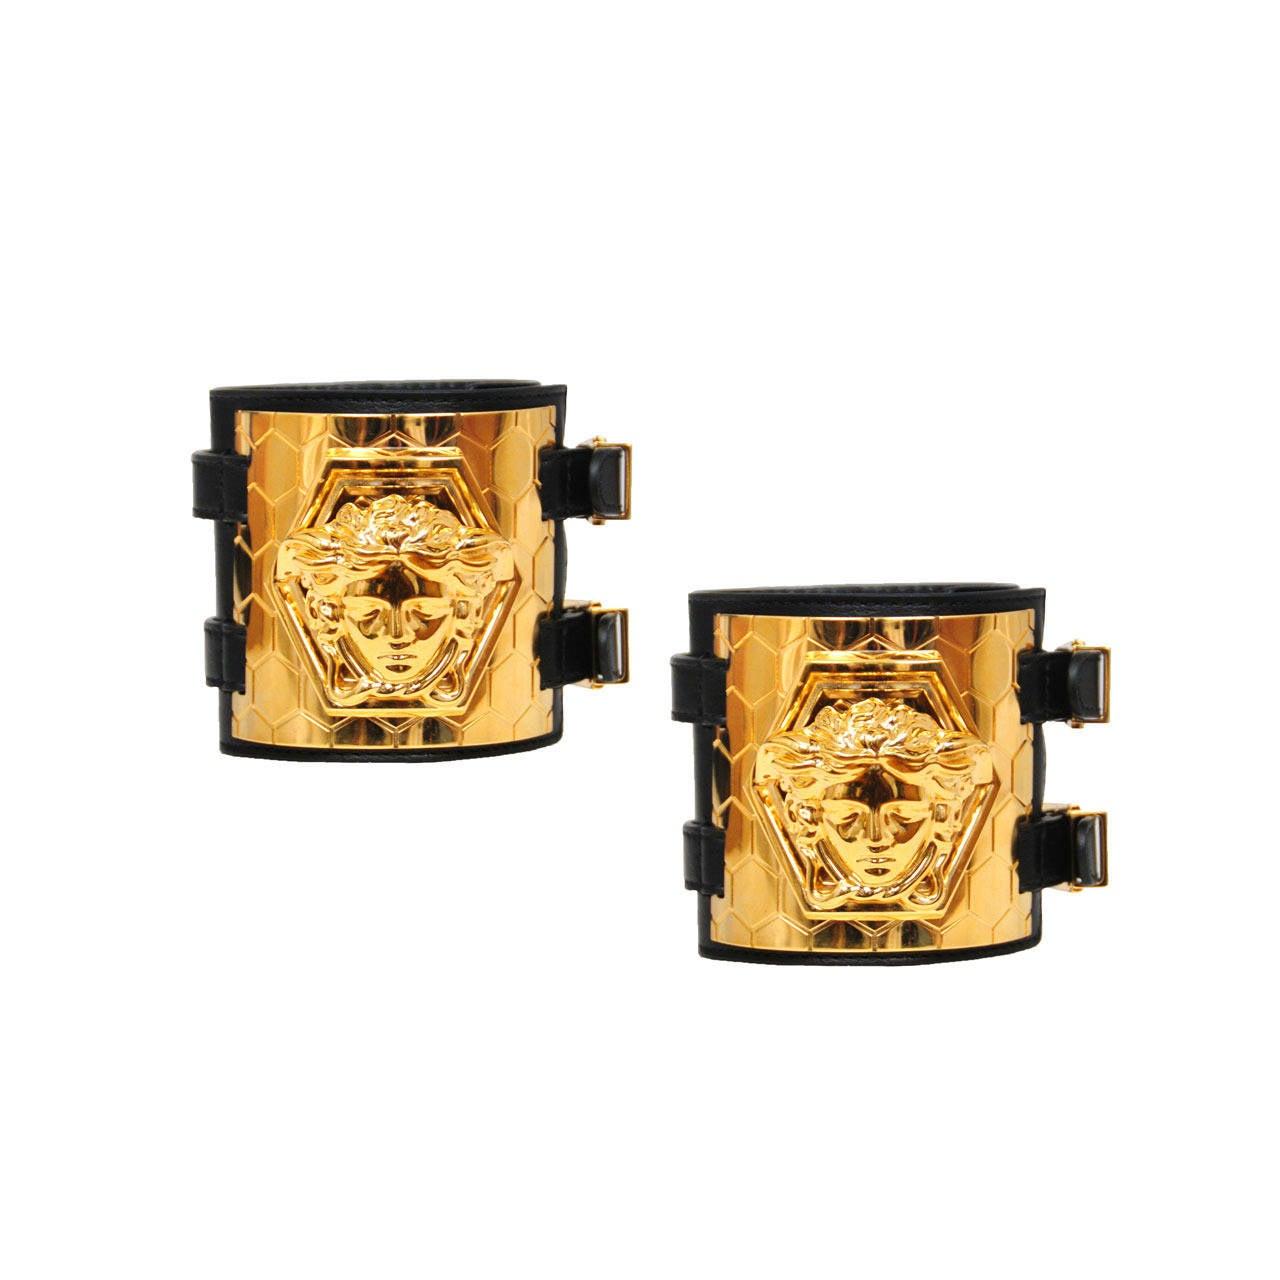 versace medusa leather cuffs at 1stdibs. Black Bedroom Furniture Sets. Home Design Ideas